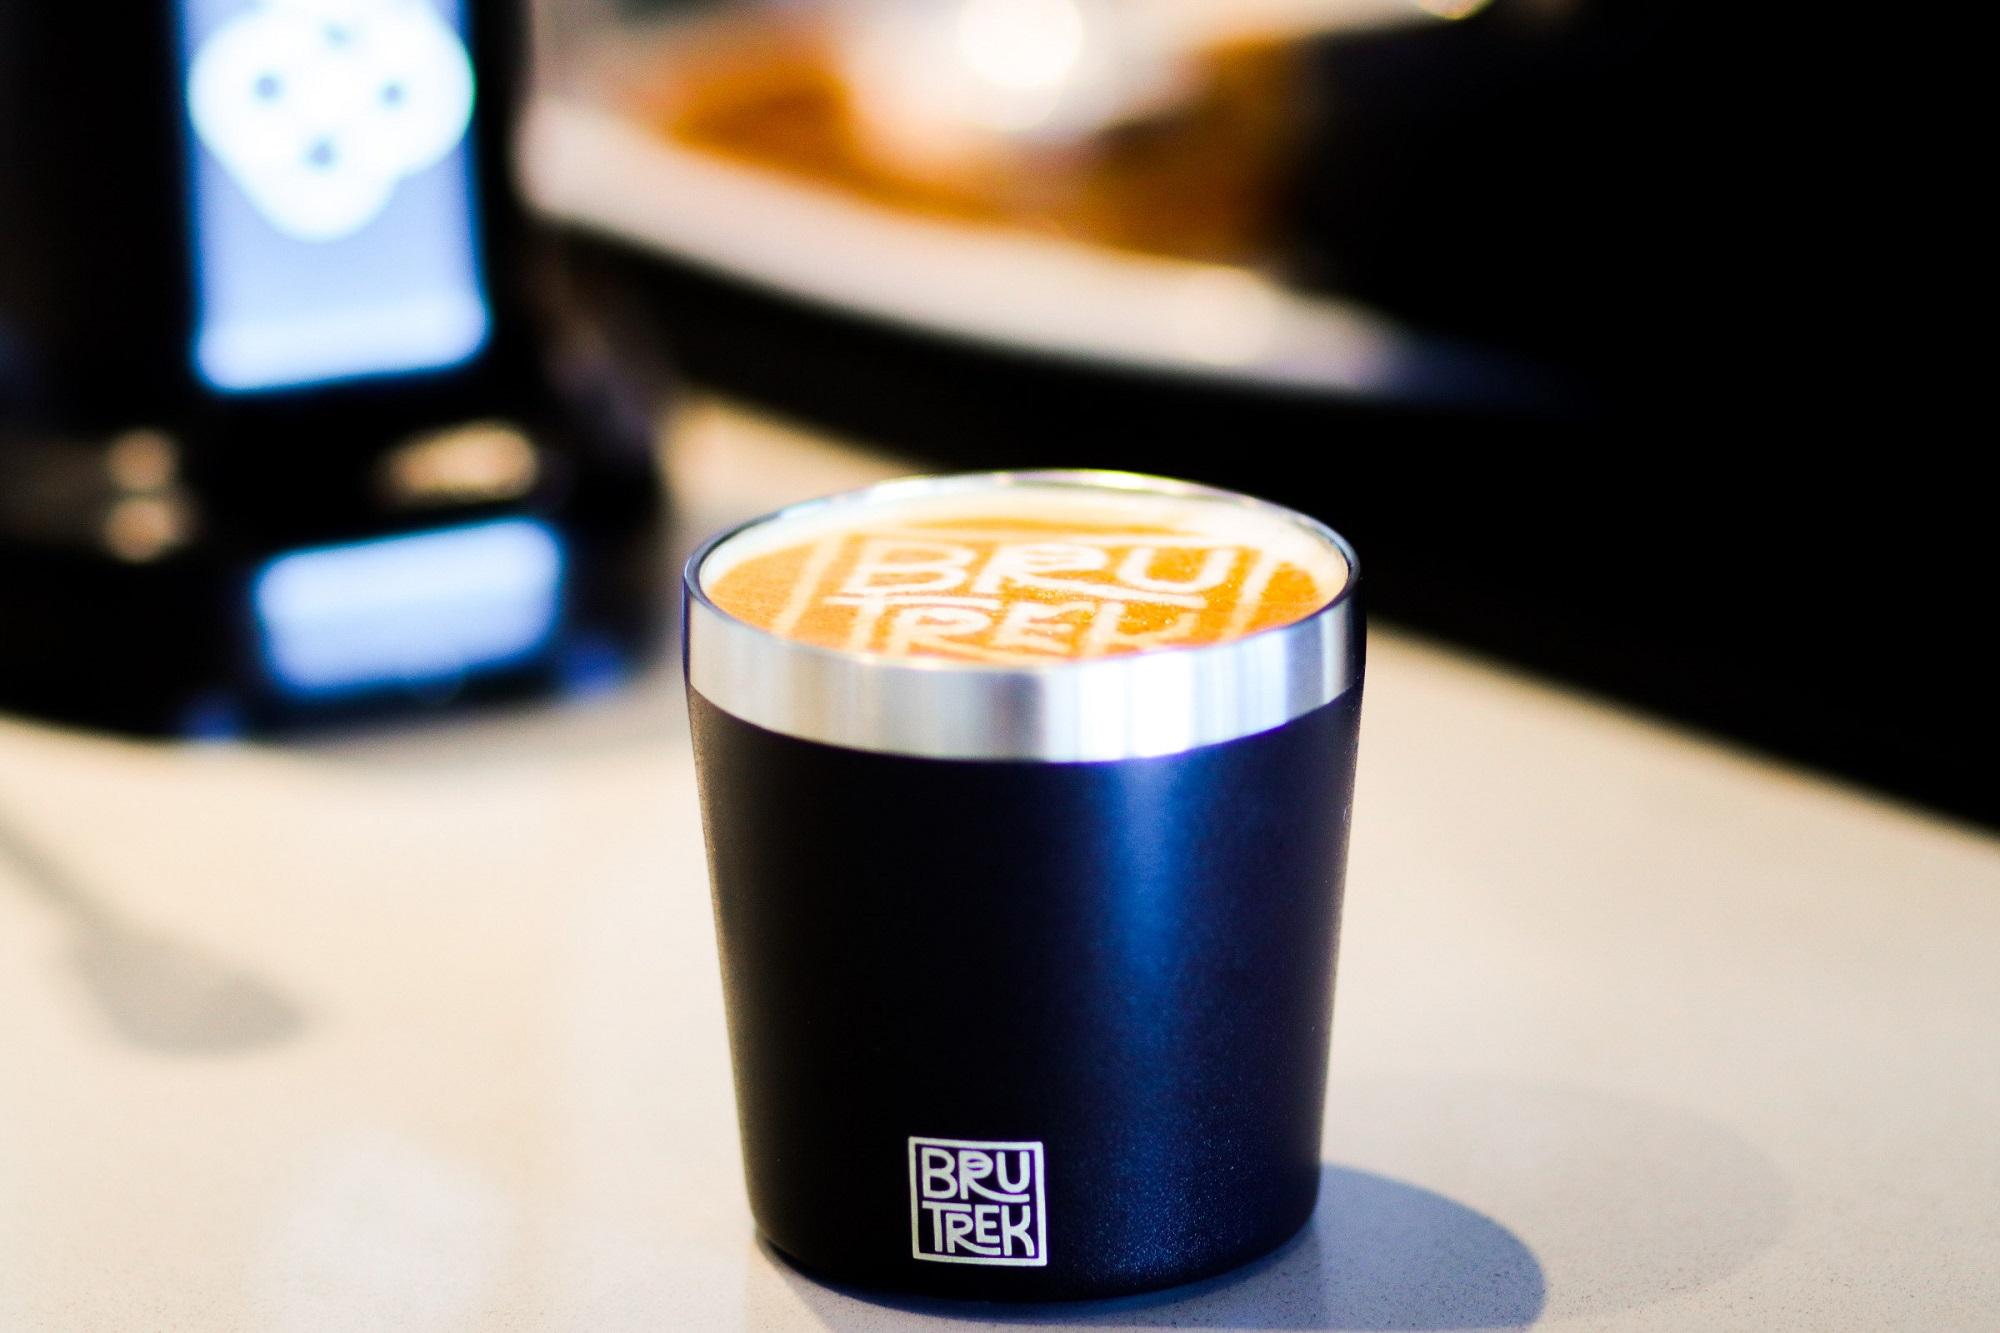 Photo of black BruTrek Camp Cup with Latte inside